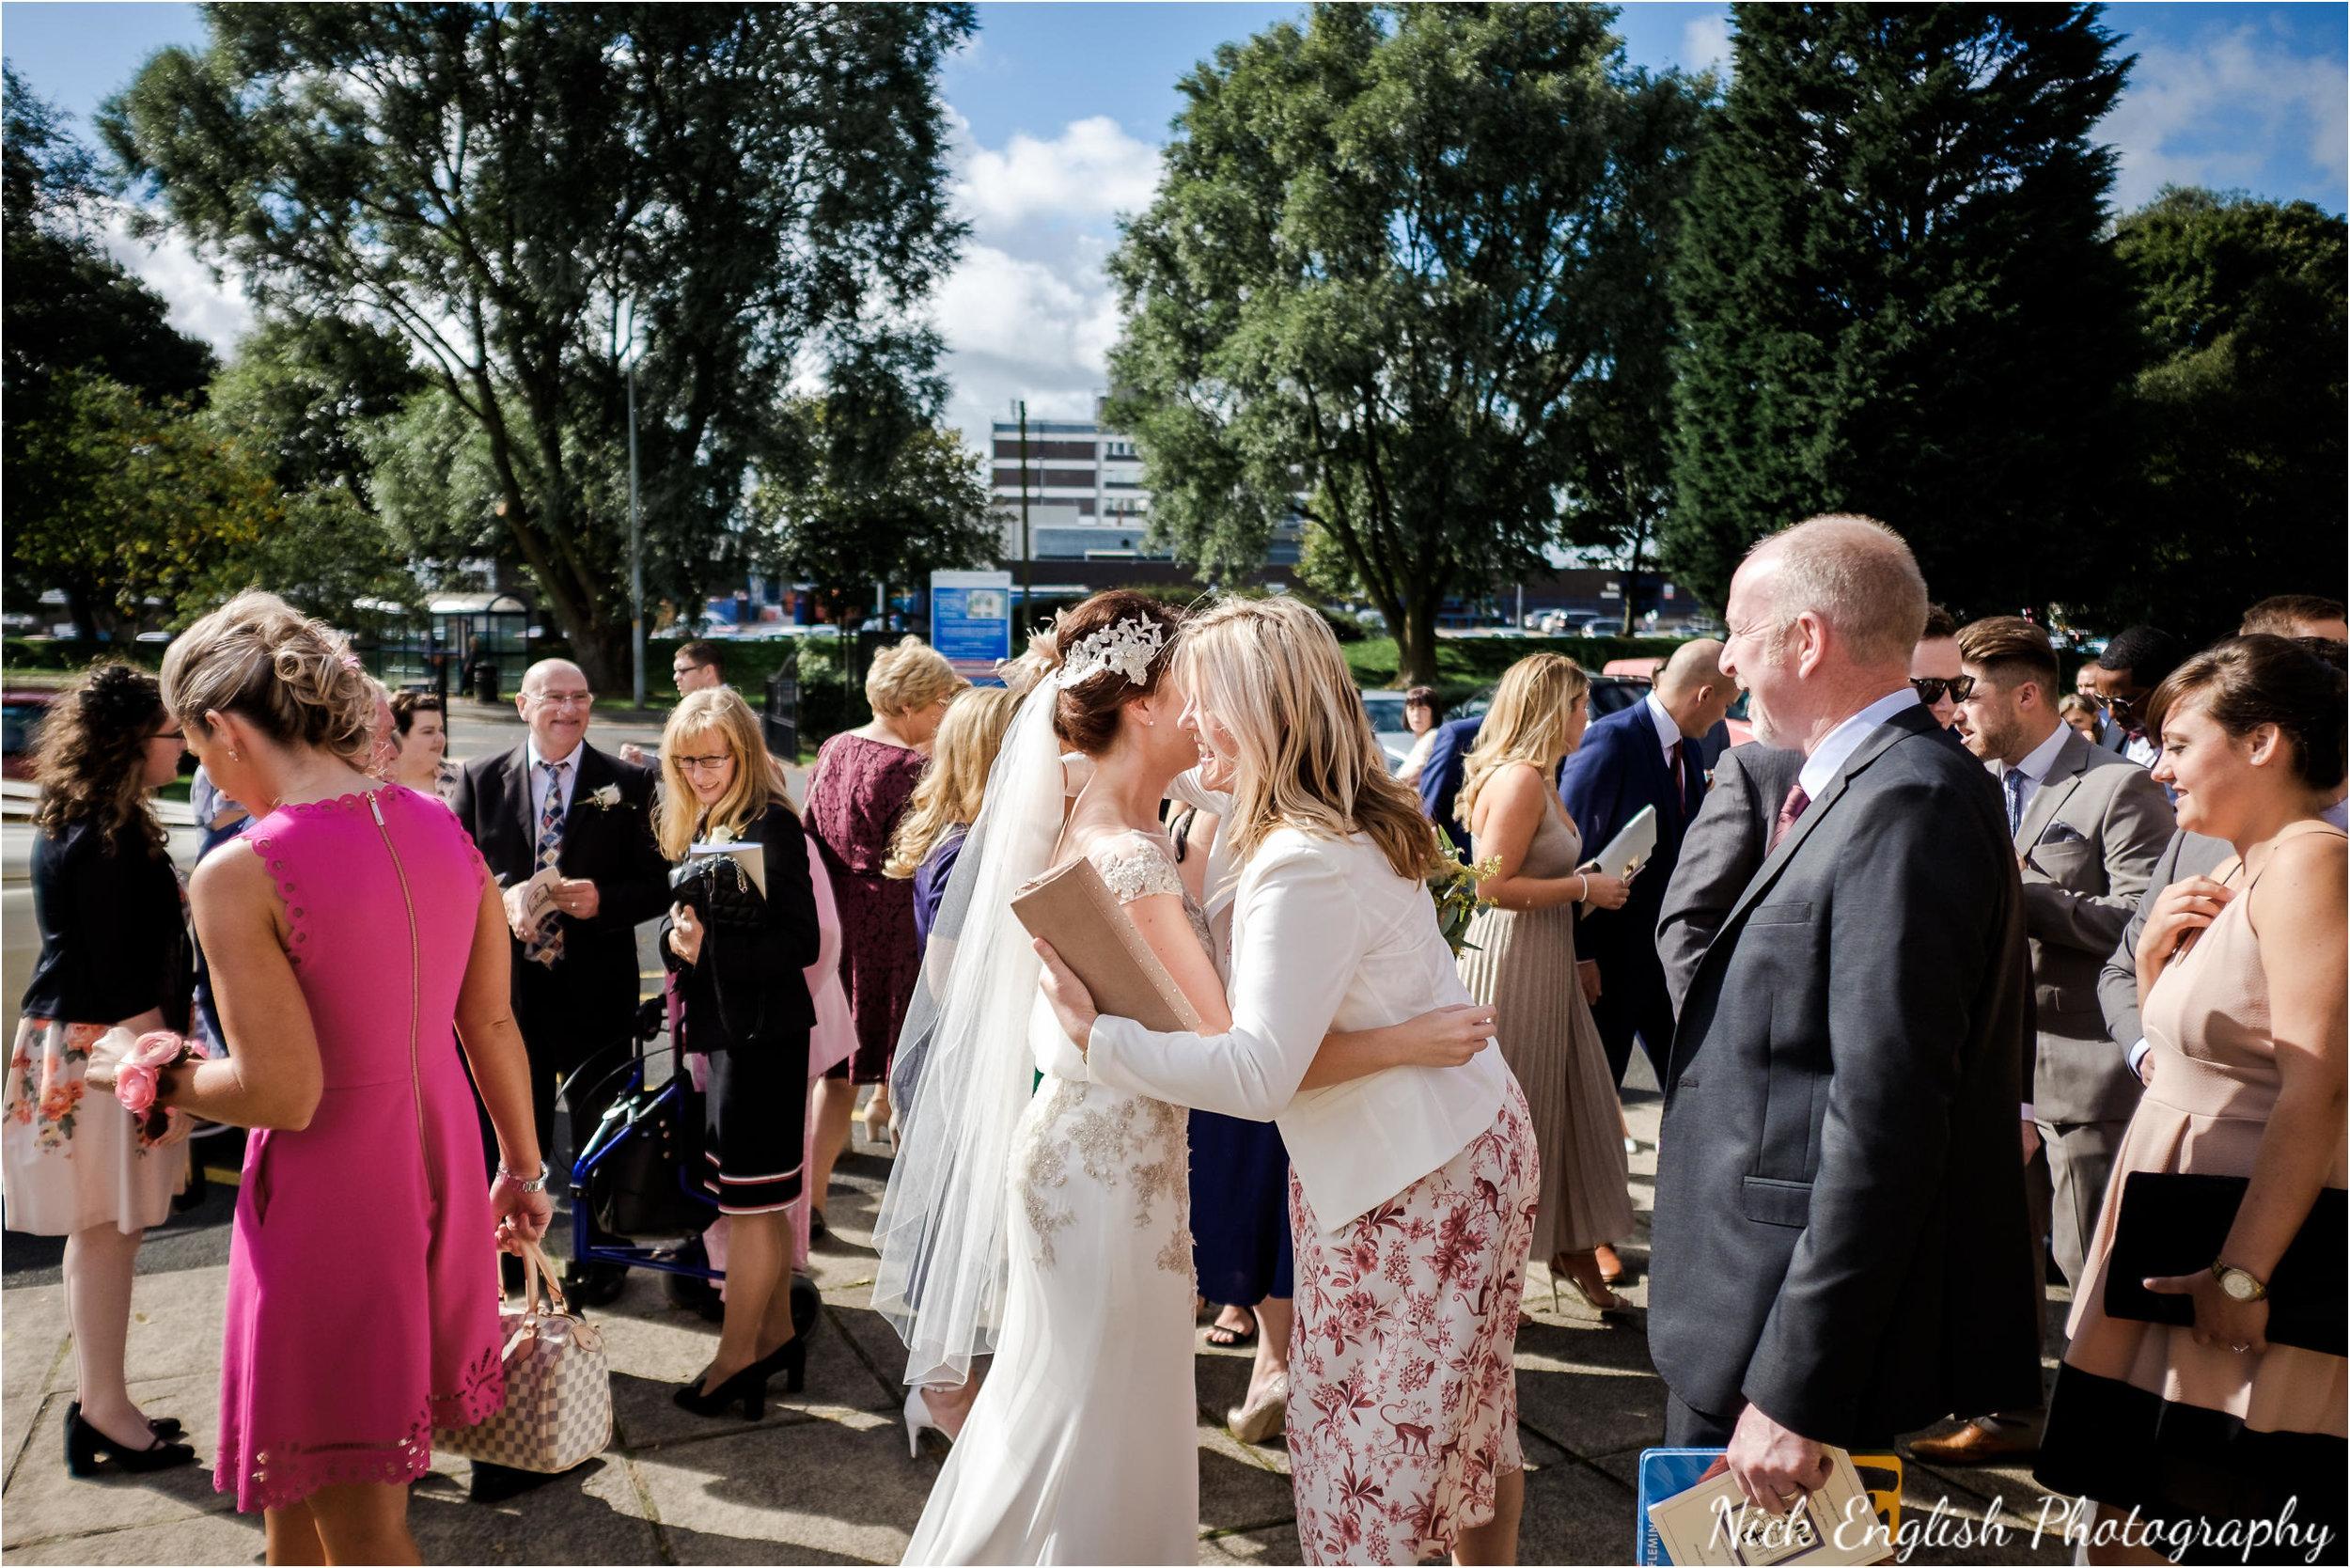 Stacey-Ash-Wedding-Photographs-Stanley-House-Preston-Lancashire-85.jpg